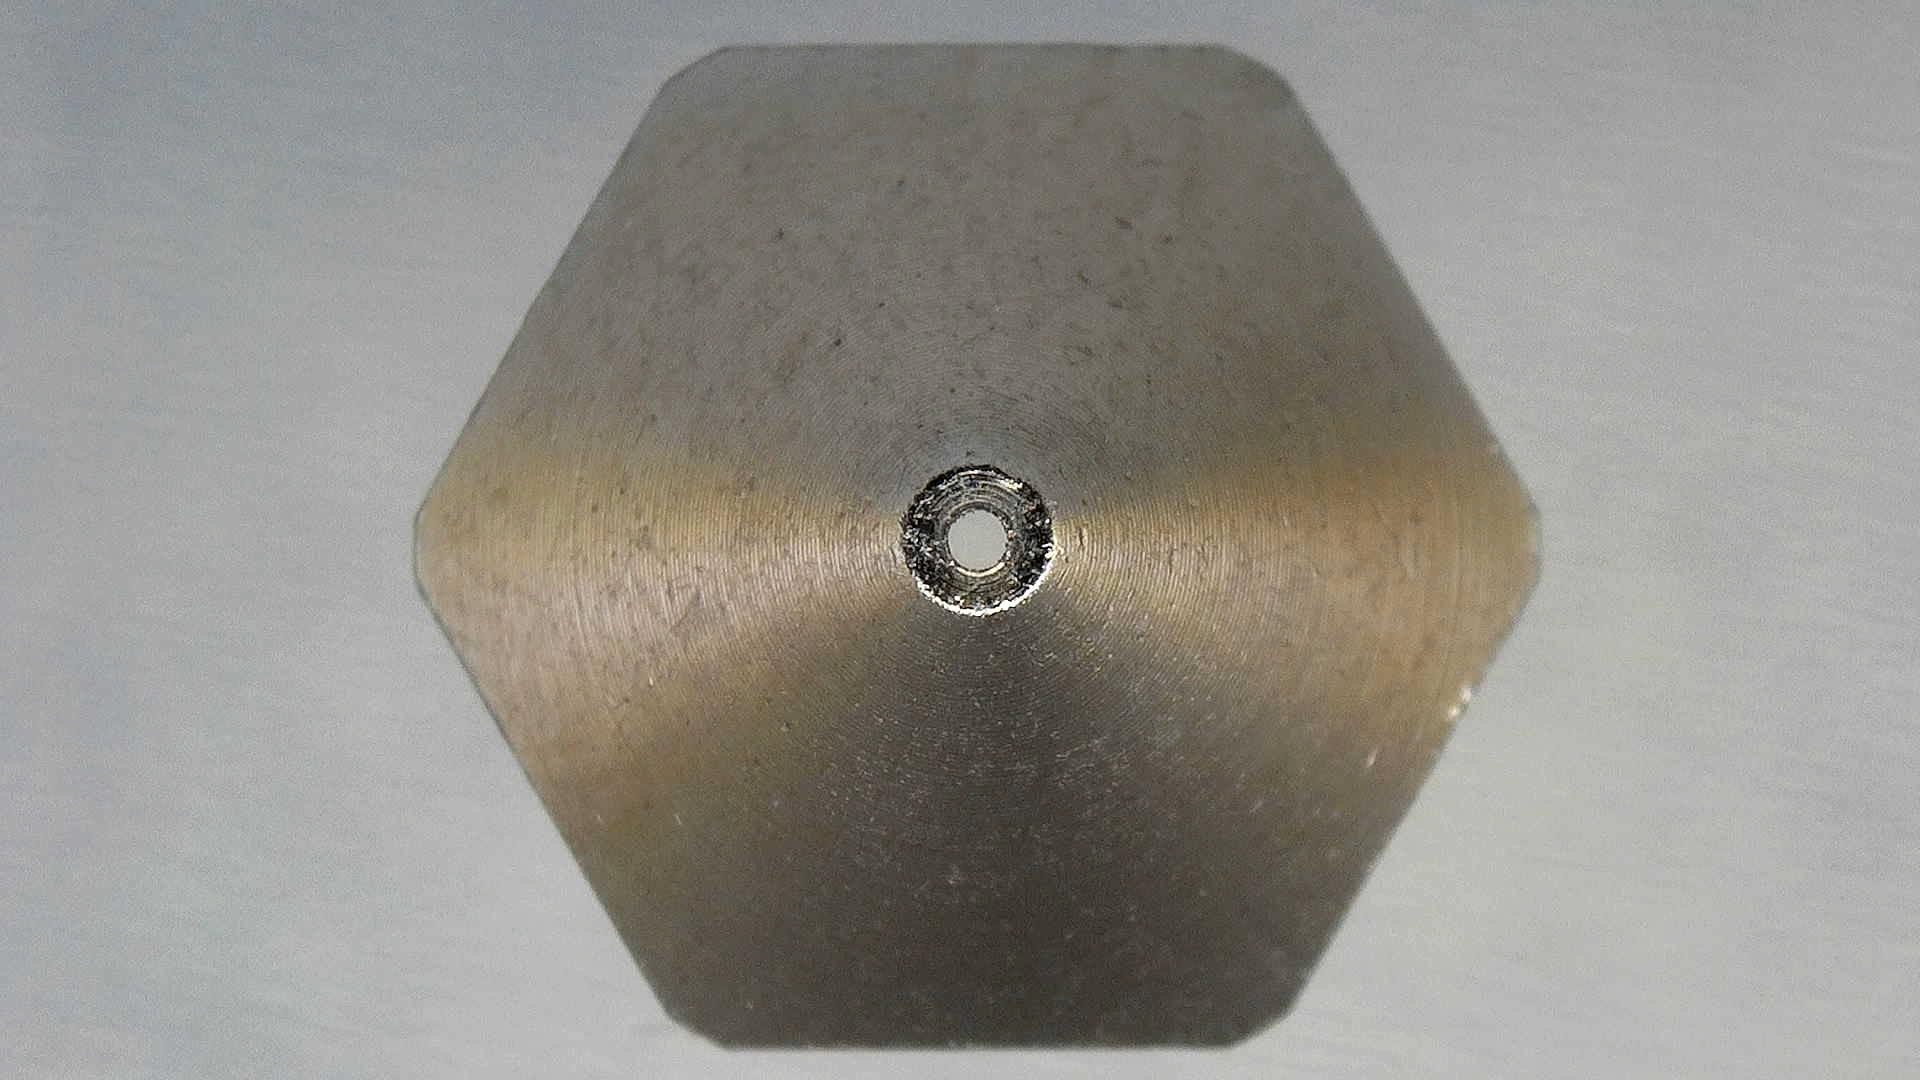 Mellow-NF-V6-Plated-Copper-Nozzle-2-3D Printer Nozzle Comparison